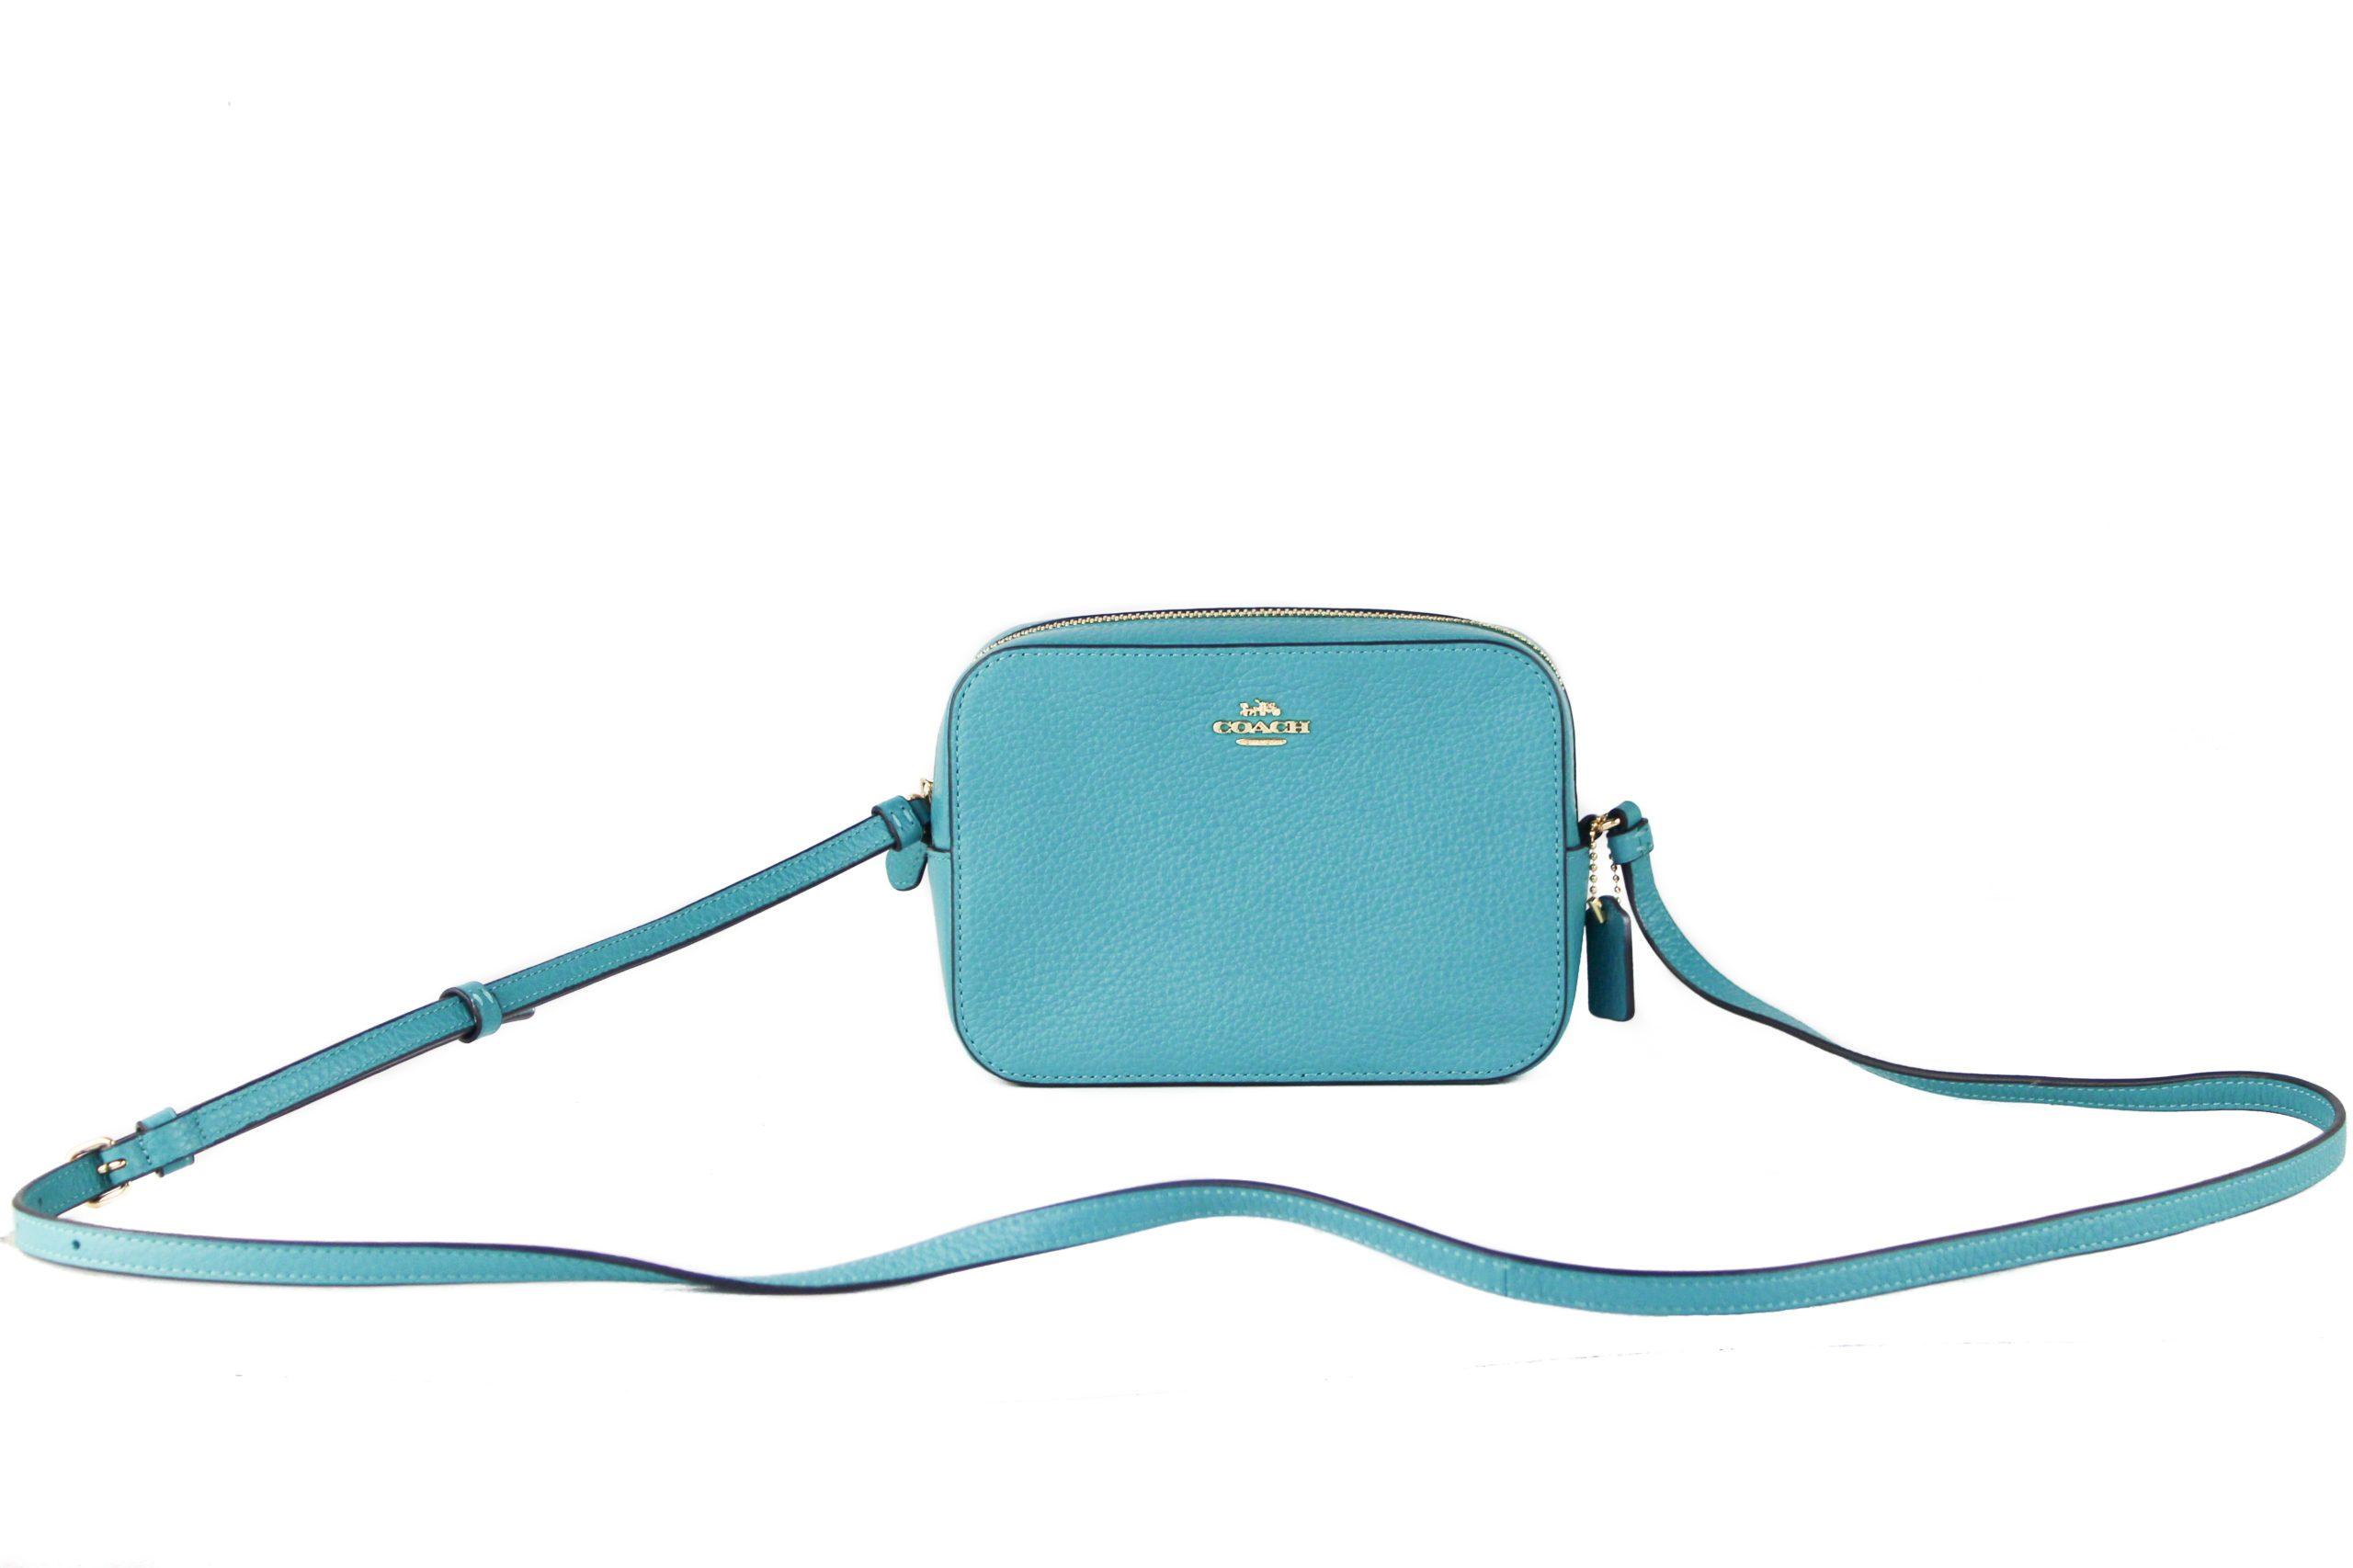 COACH Women's Canvas Leather Crossbody Bag Teal 64064